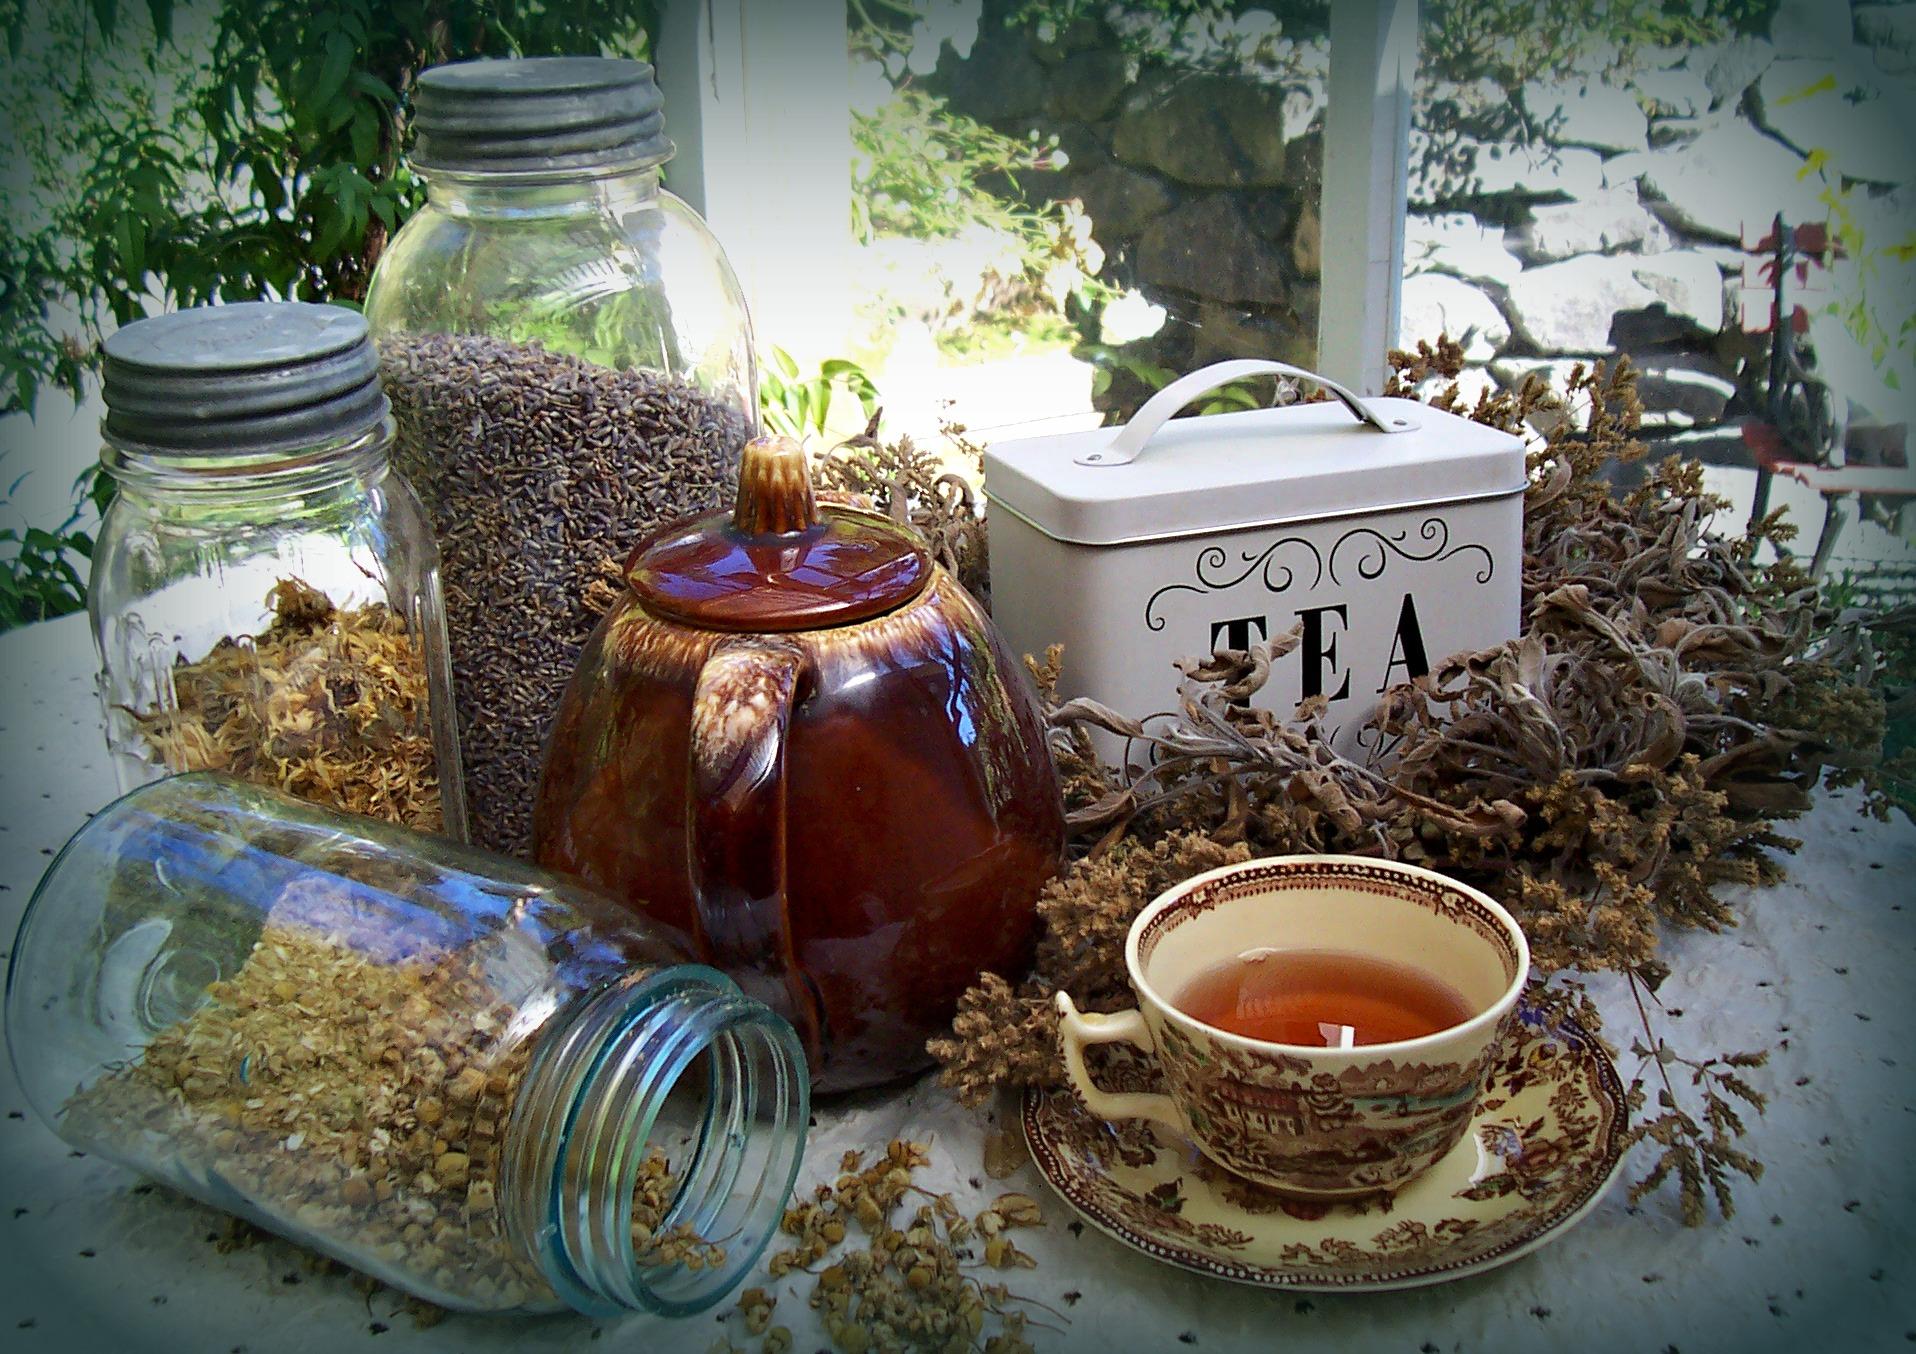 Last minute gift idea wrap up tea time creative gardener - Backyard patio design ideas to accompany your tea time ...